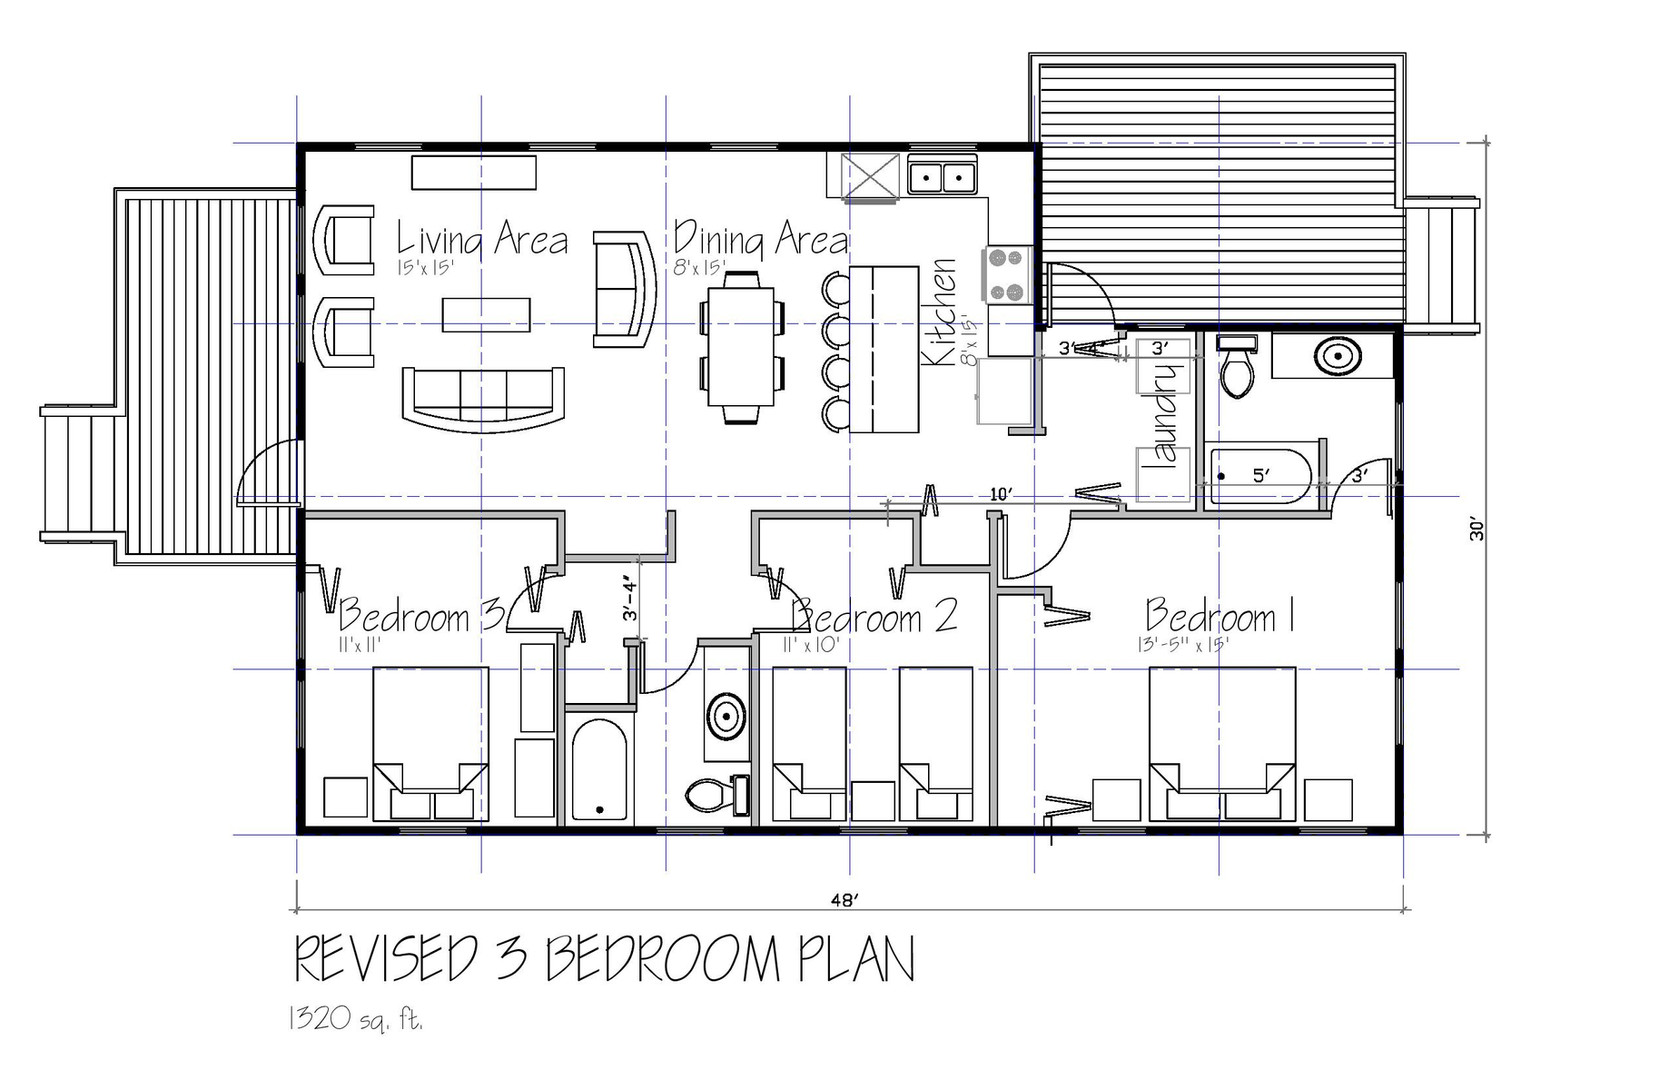 RESTORATION Revised 3 Bedroom Plan-page-